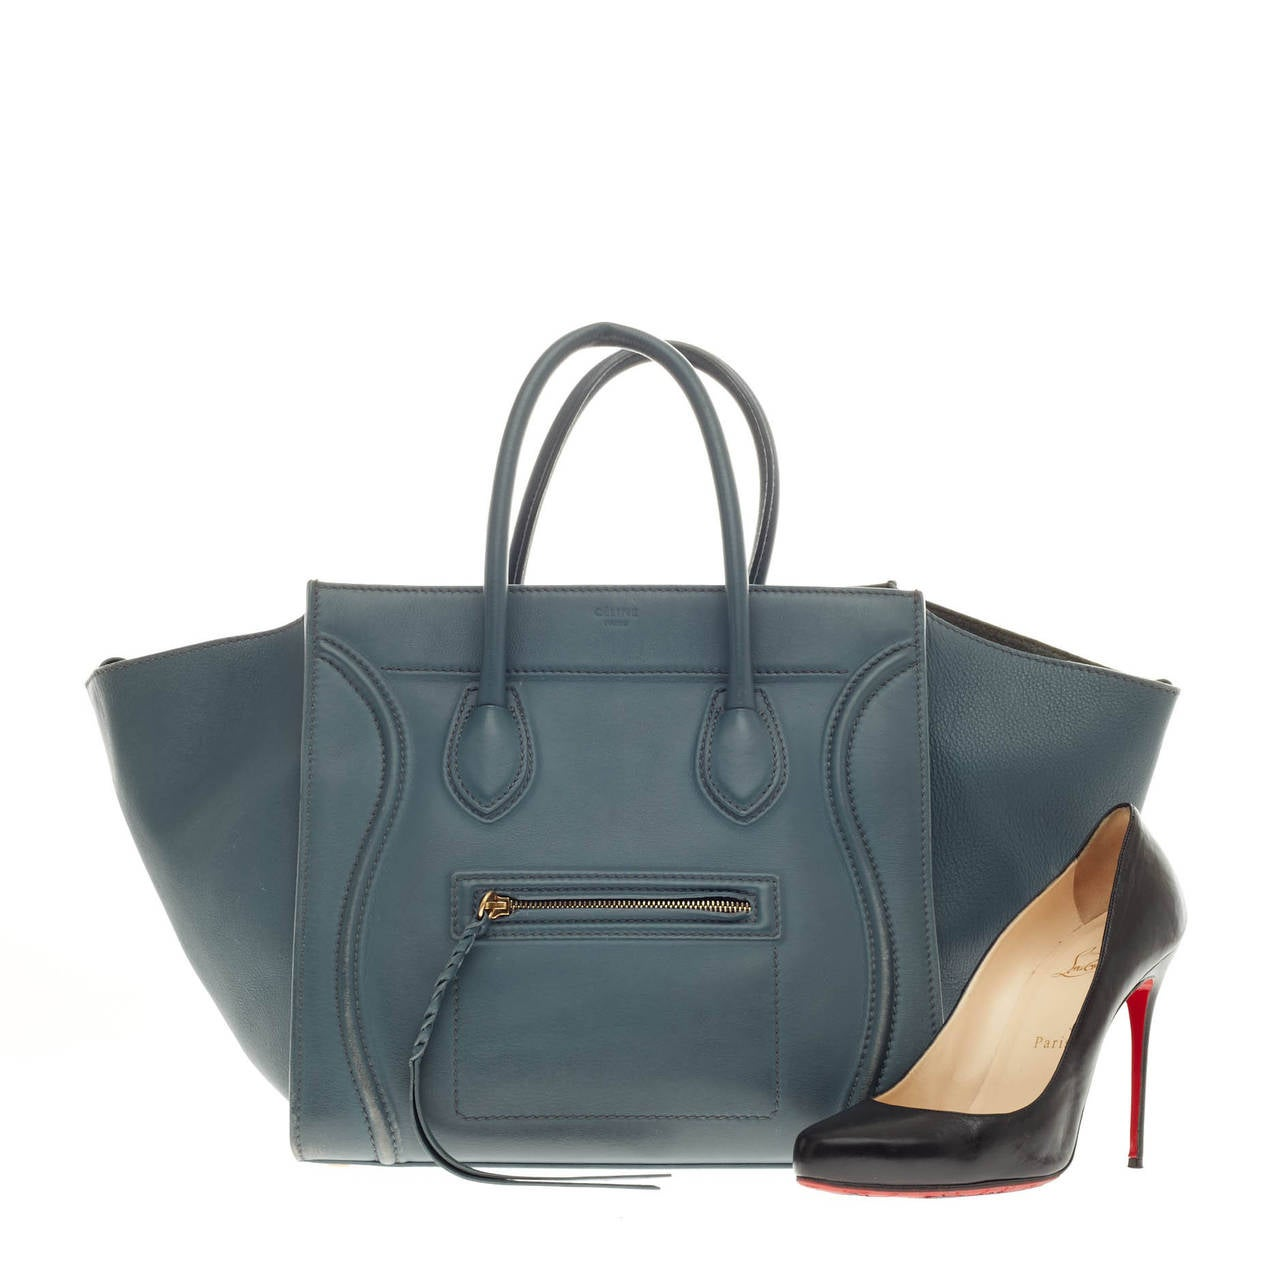 Celine Phantom Smooth Leather Large 2